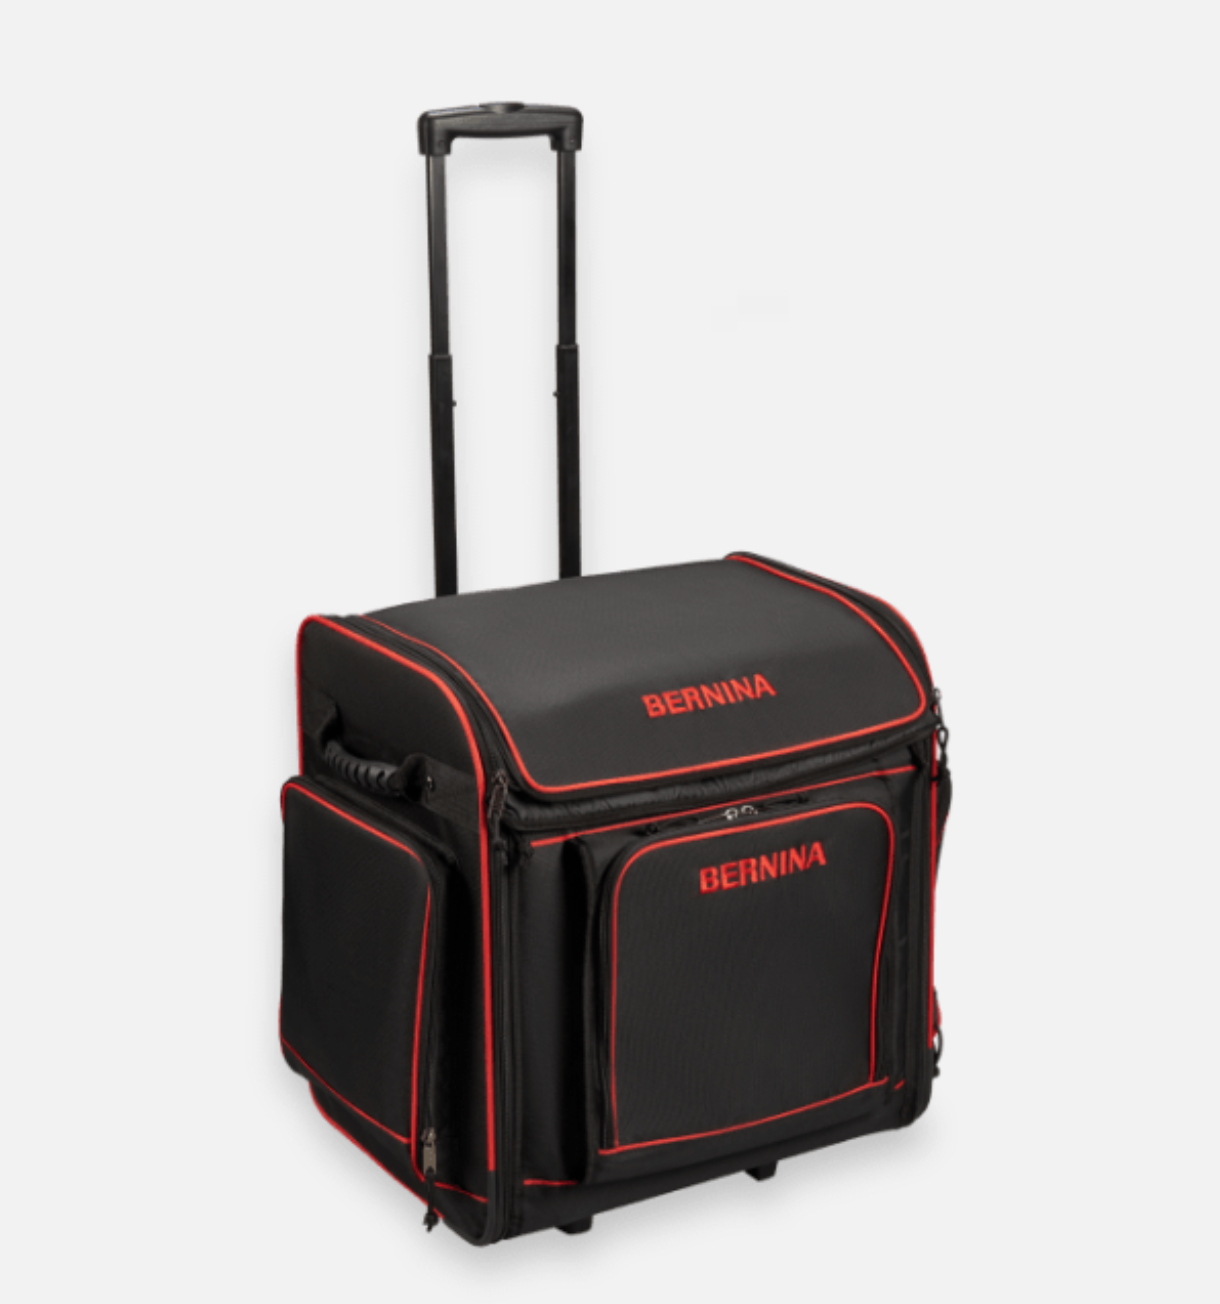 Bernina Overlocker/Serger Suitcase